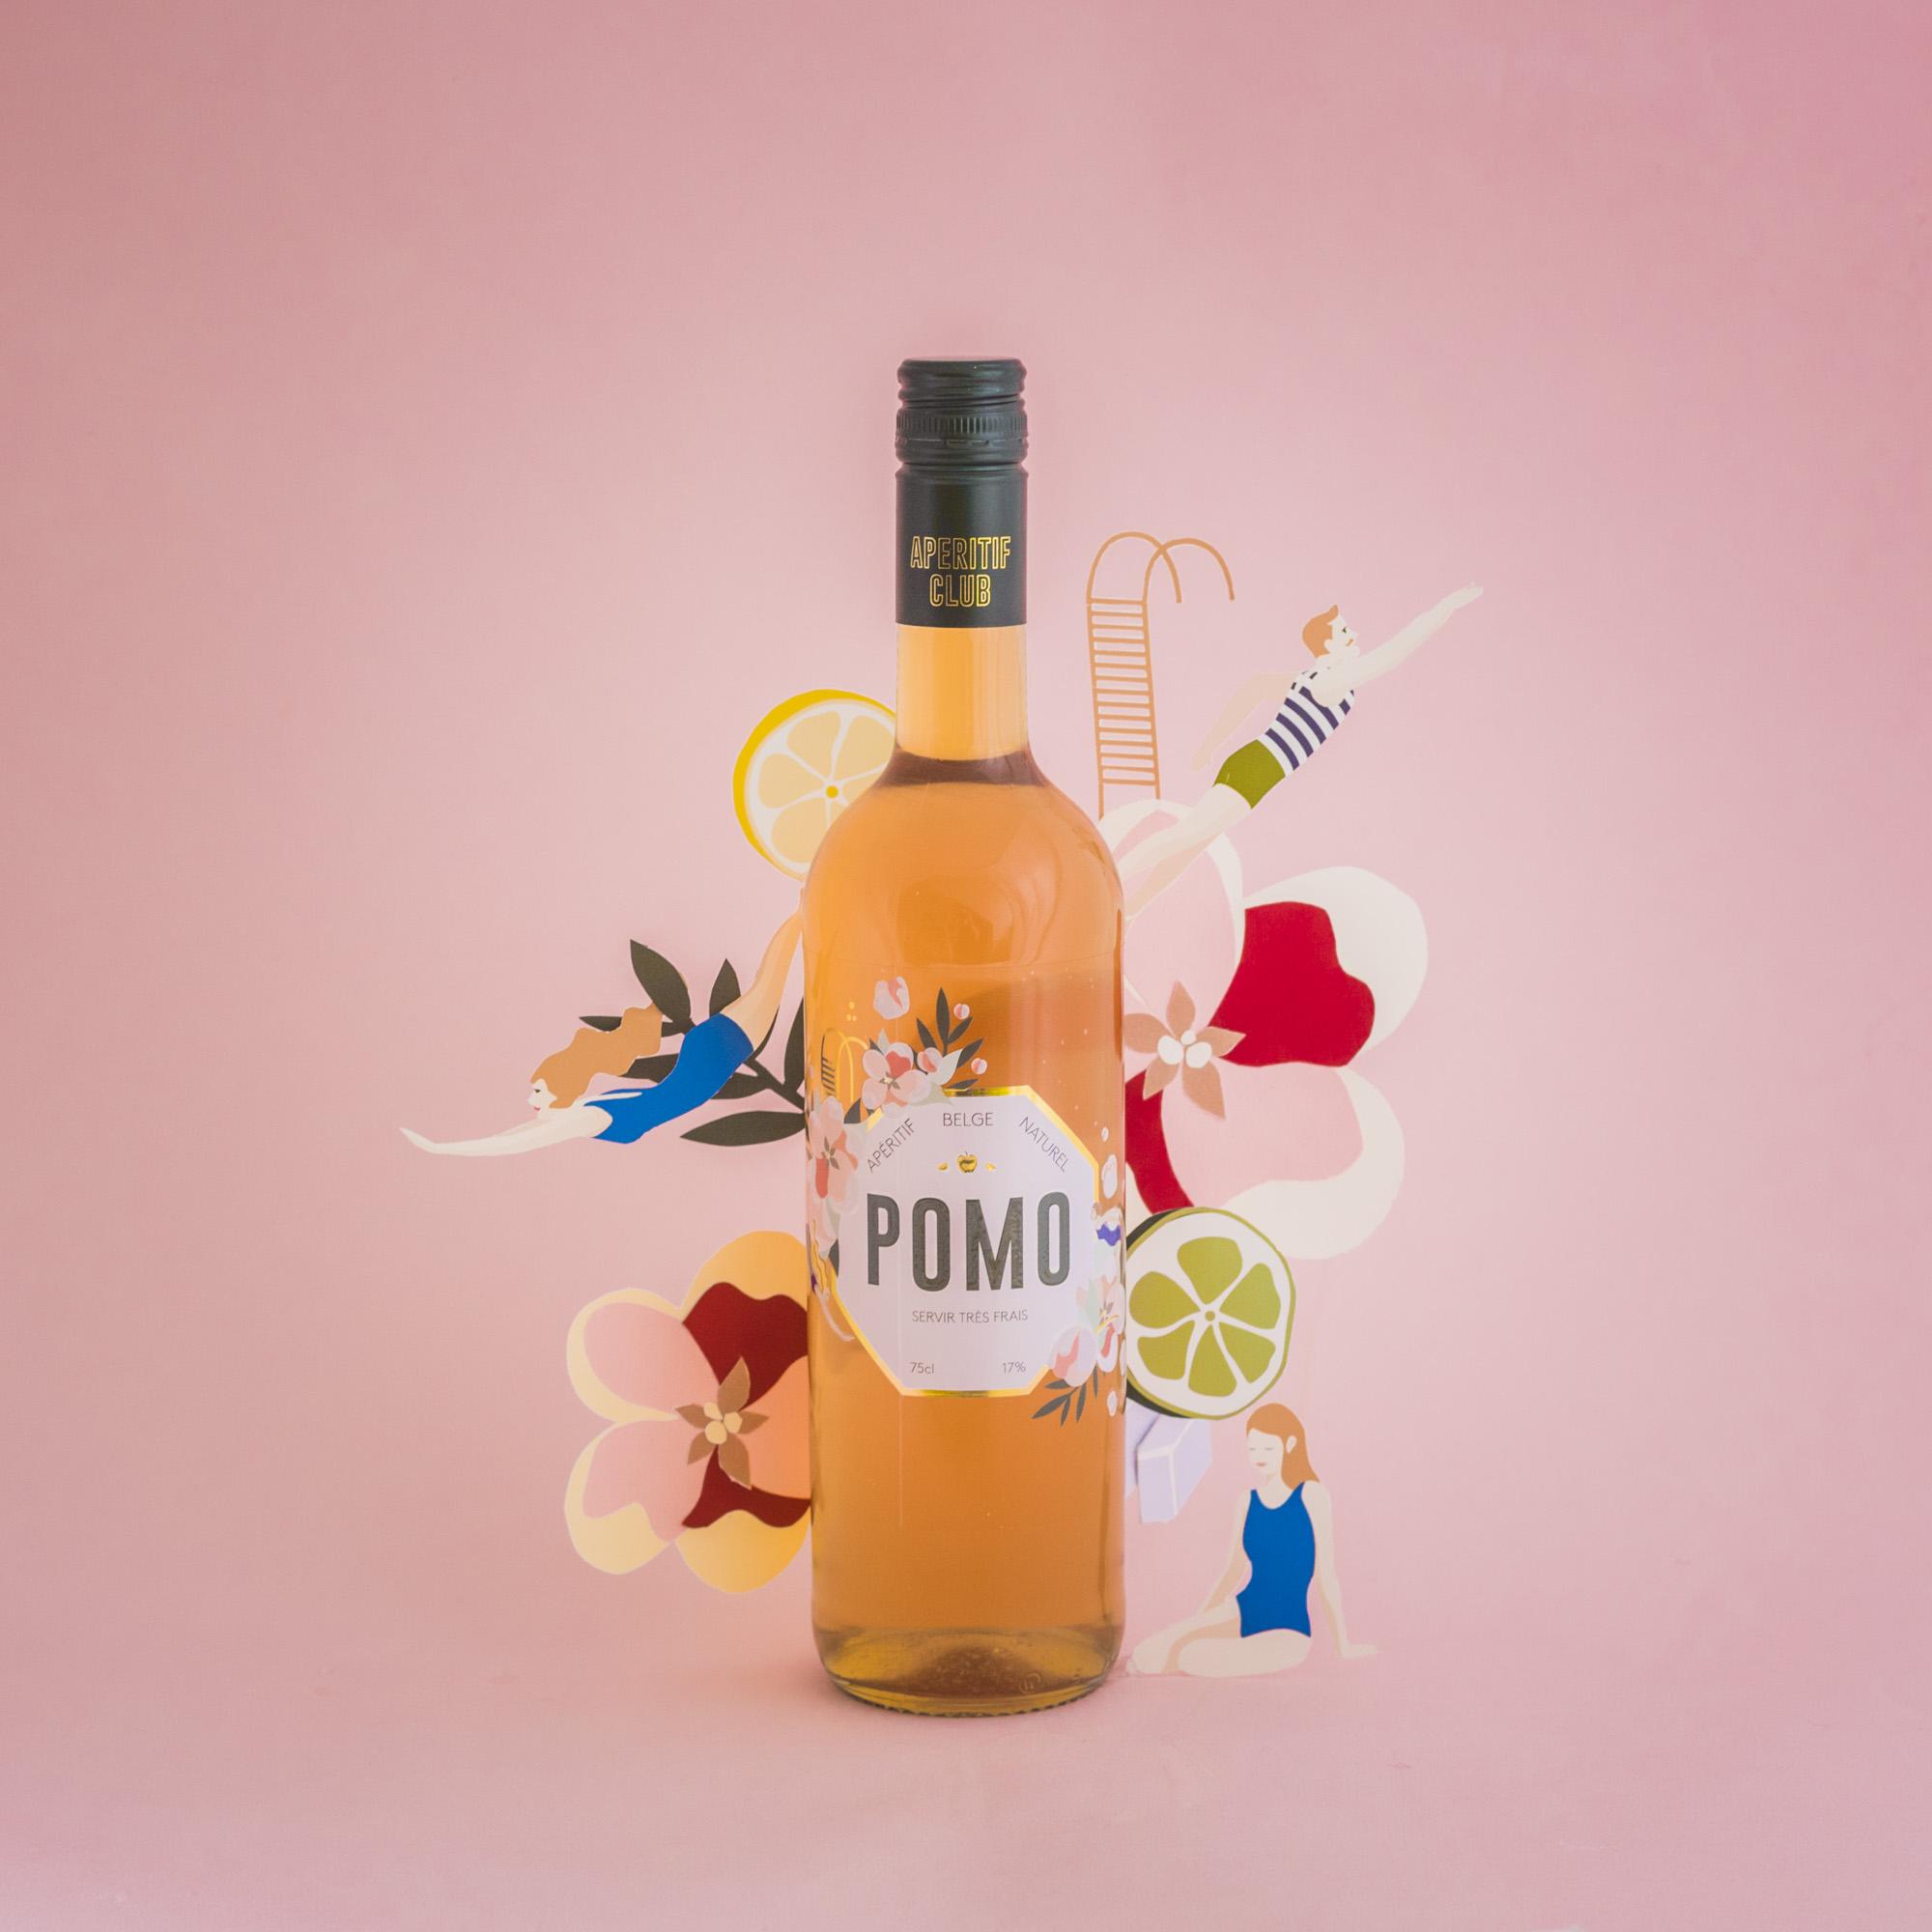 pomo, aperitif, 100% belge, habillage bouteille, packaging, branding,